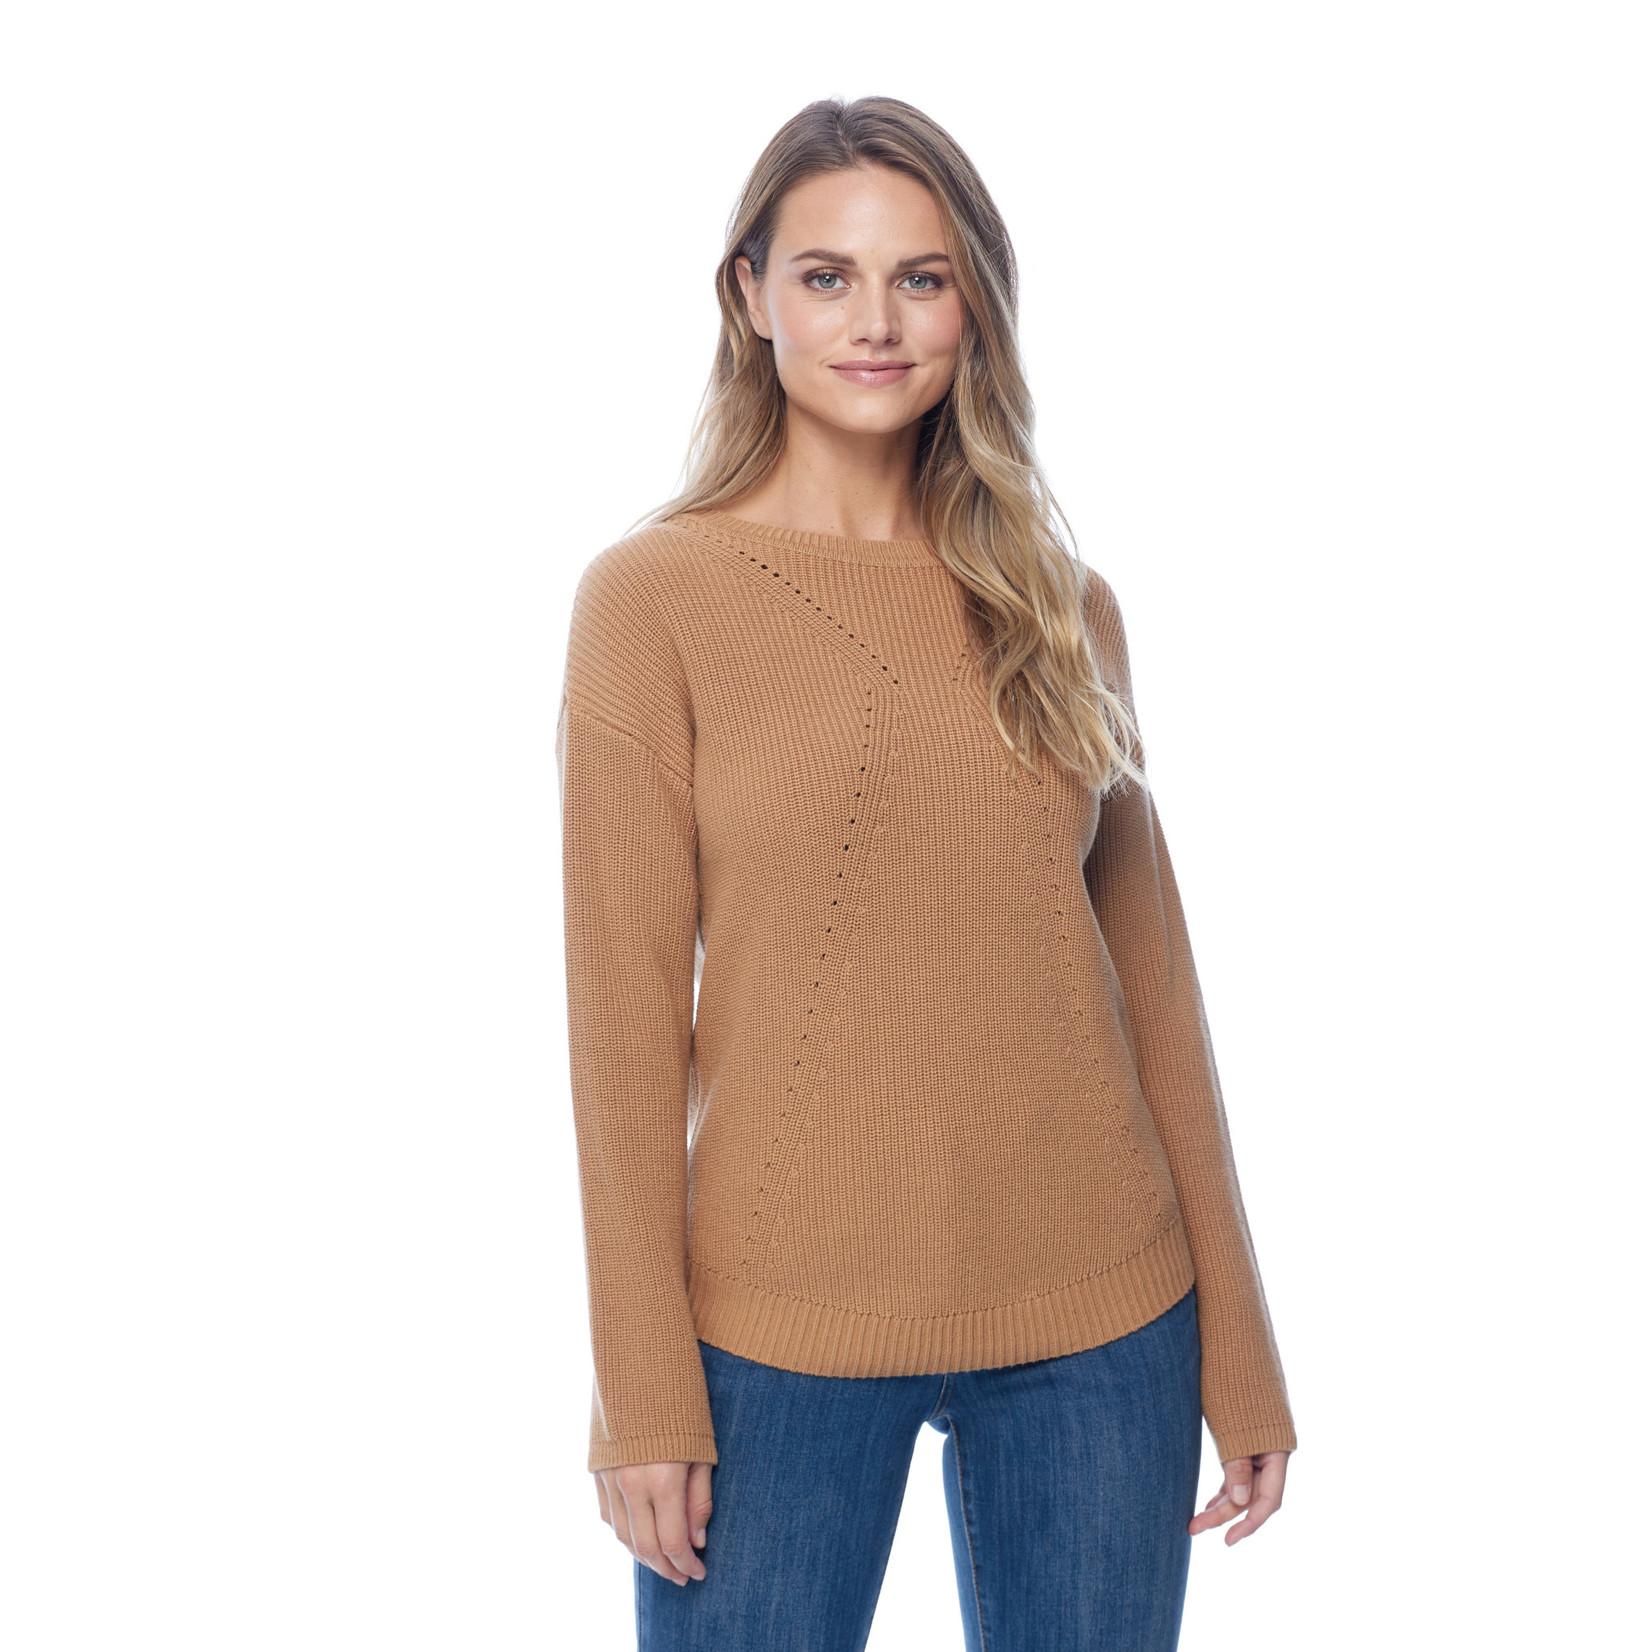 FDJ Shaker Stitch Boat Neck Sweater *More Colors*